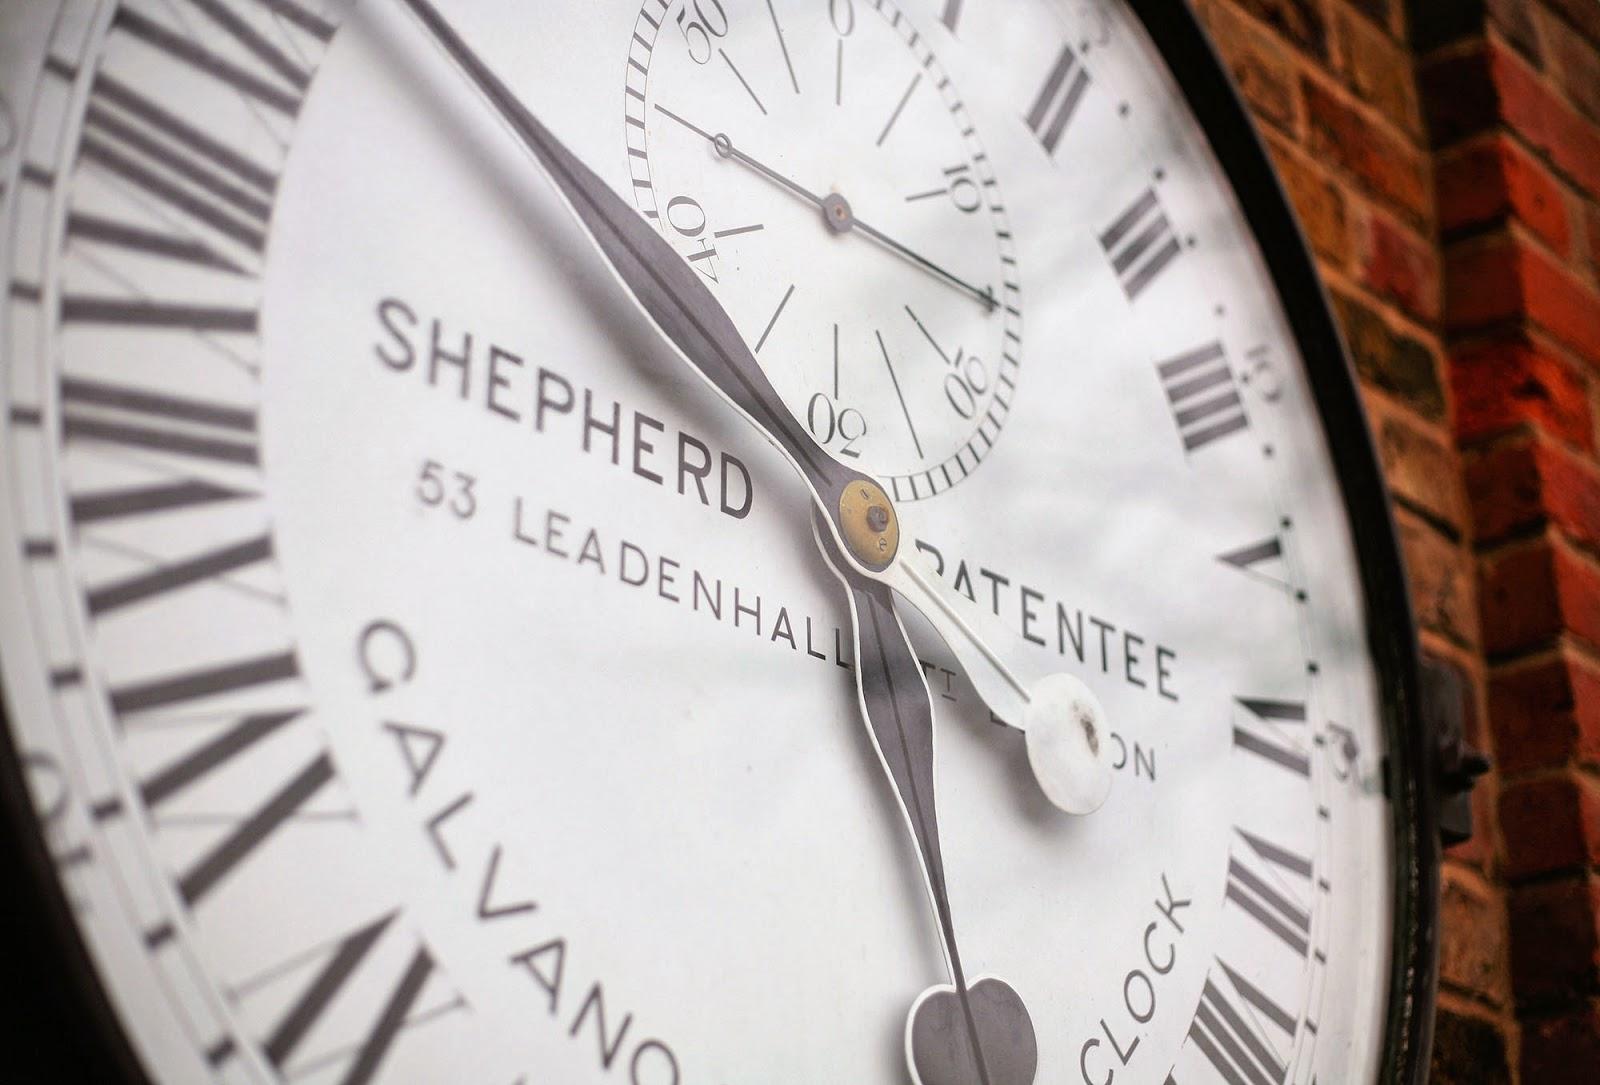 24 hour clock, Greenwich Meridian.